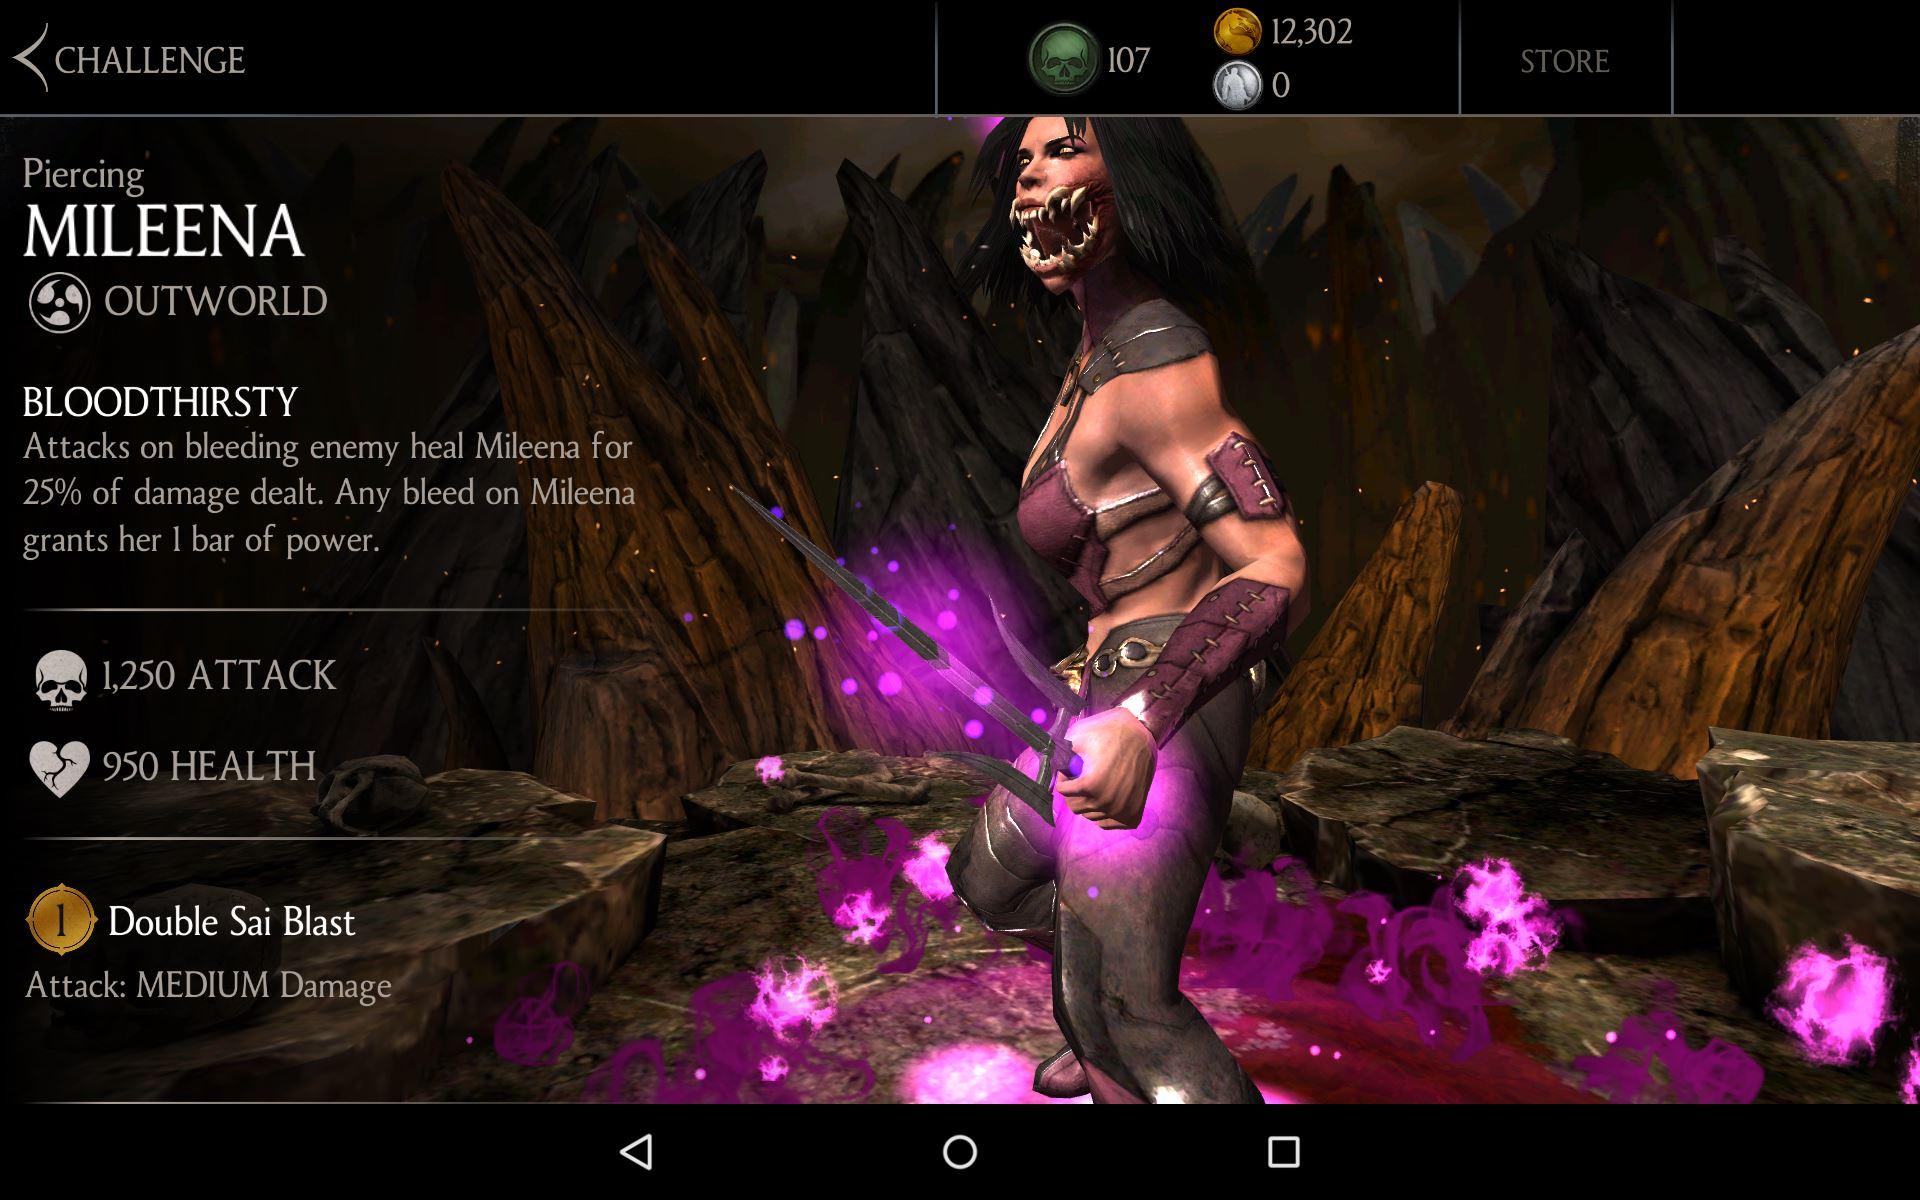 Mortal kombat x mileena fucks for outworld 10